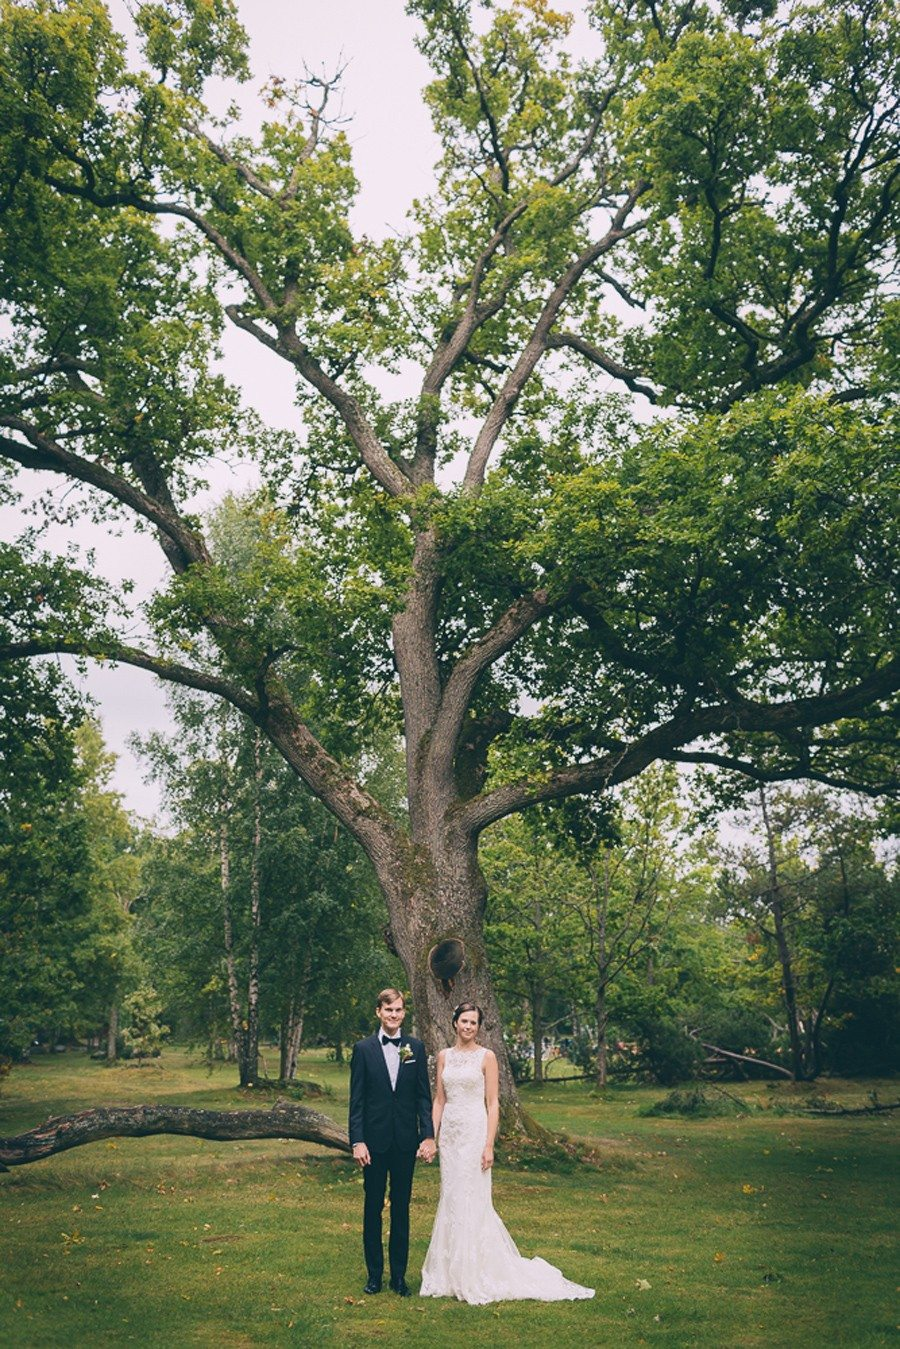 lokeroos_bröllopsfotograf_skåne027